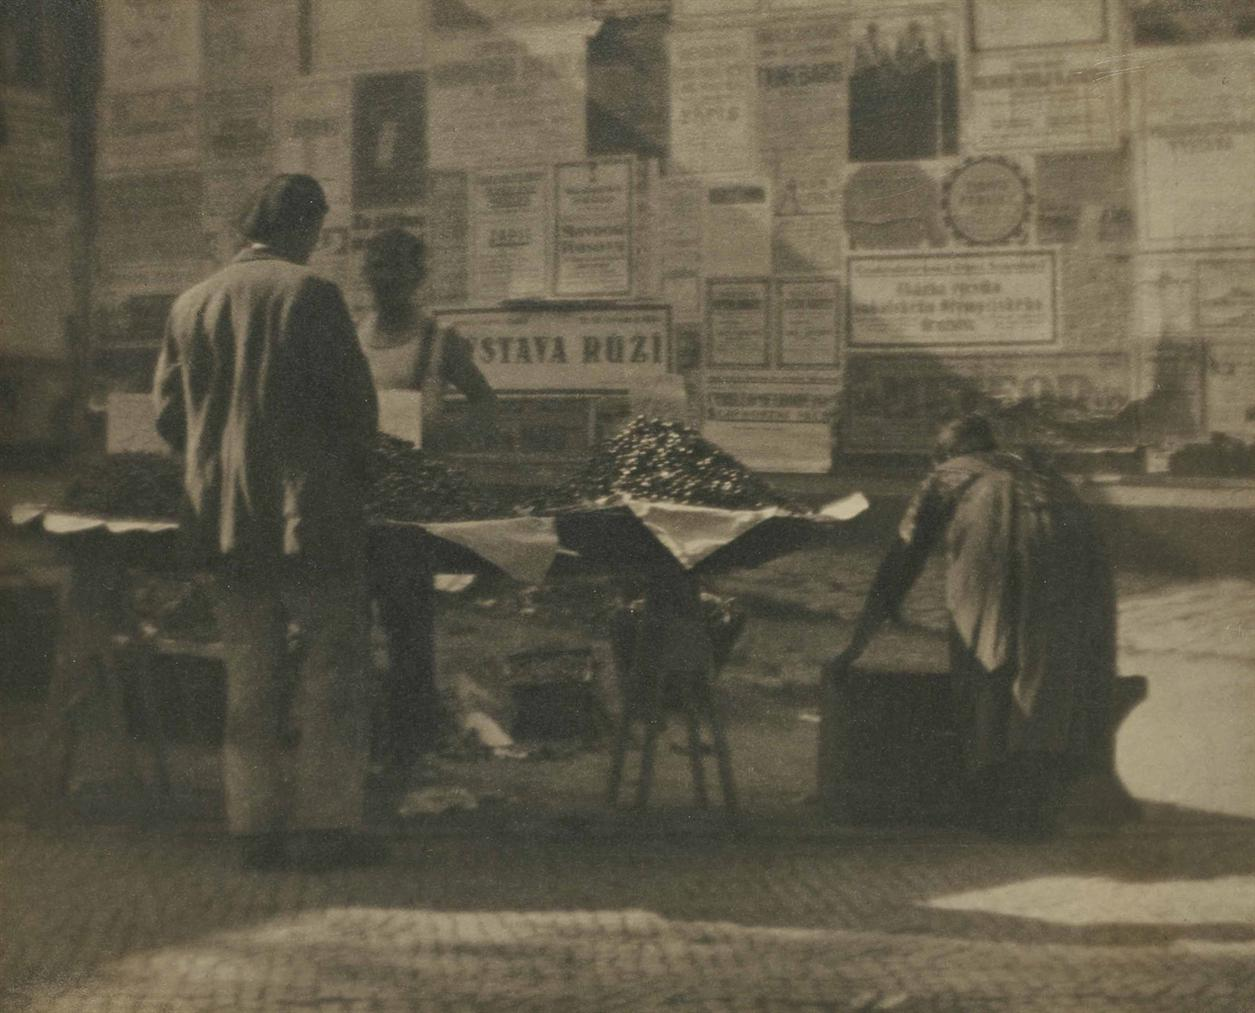 Josef Sudek-Street Market-1926